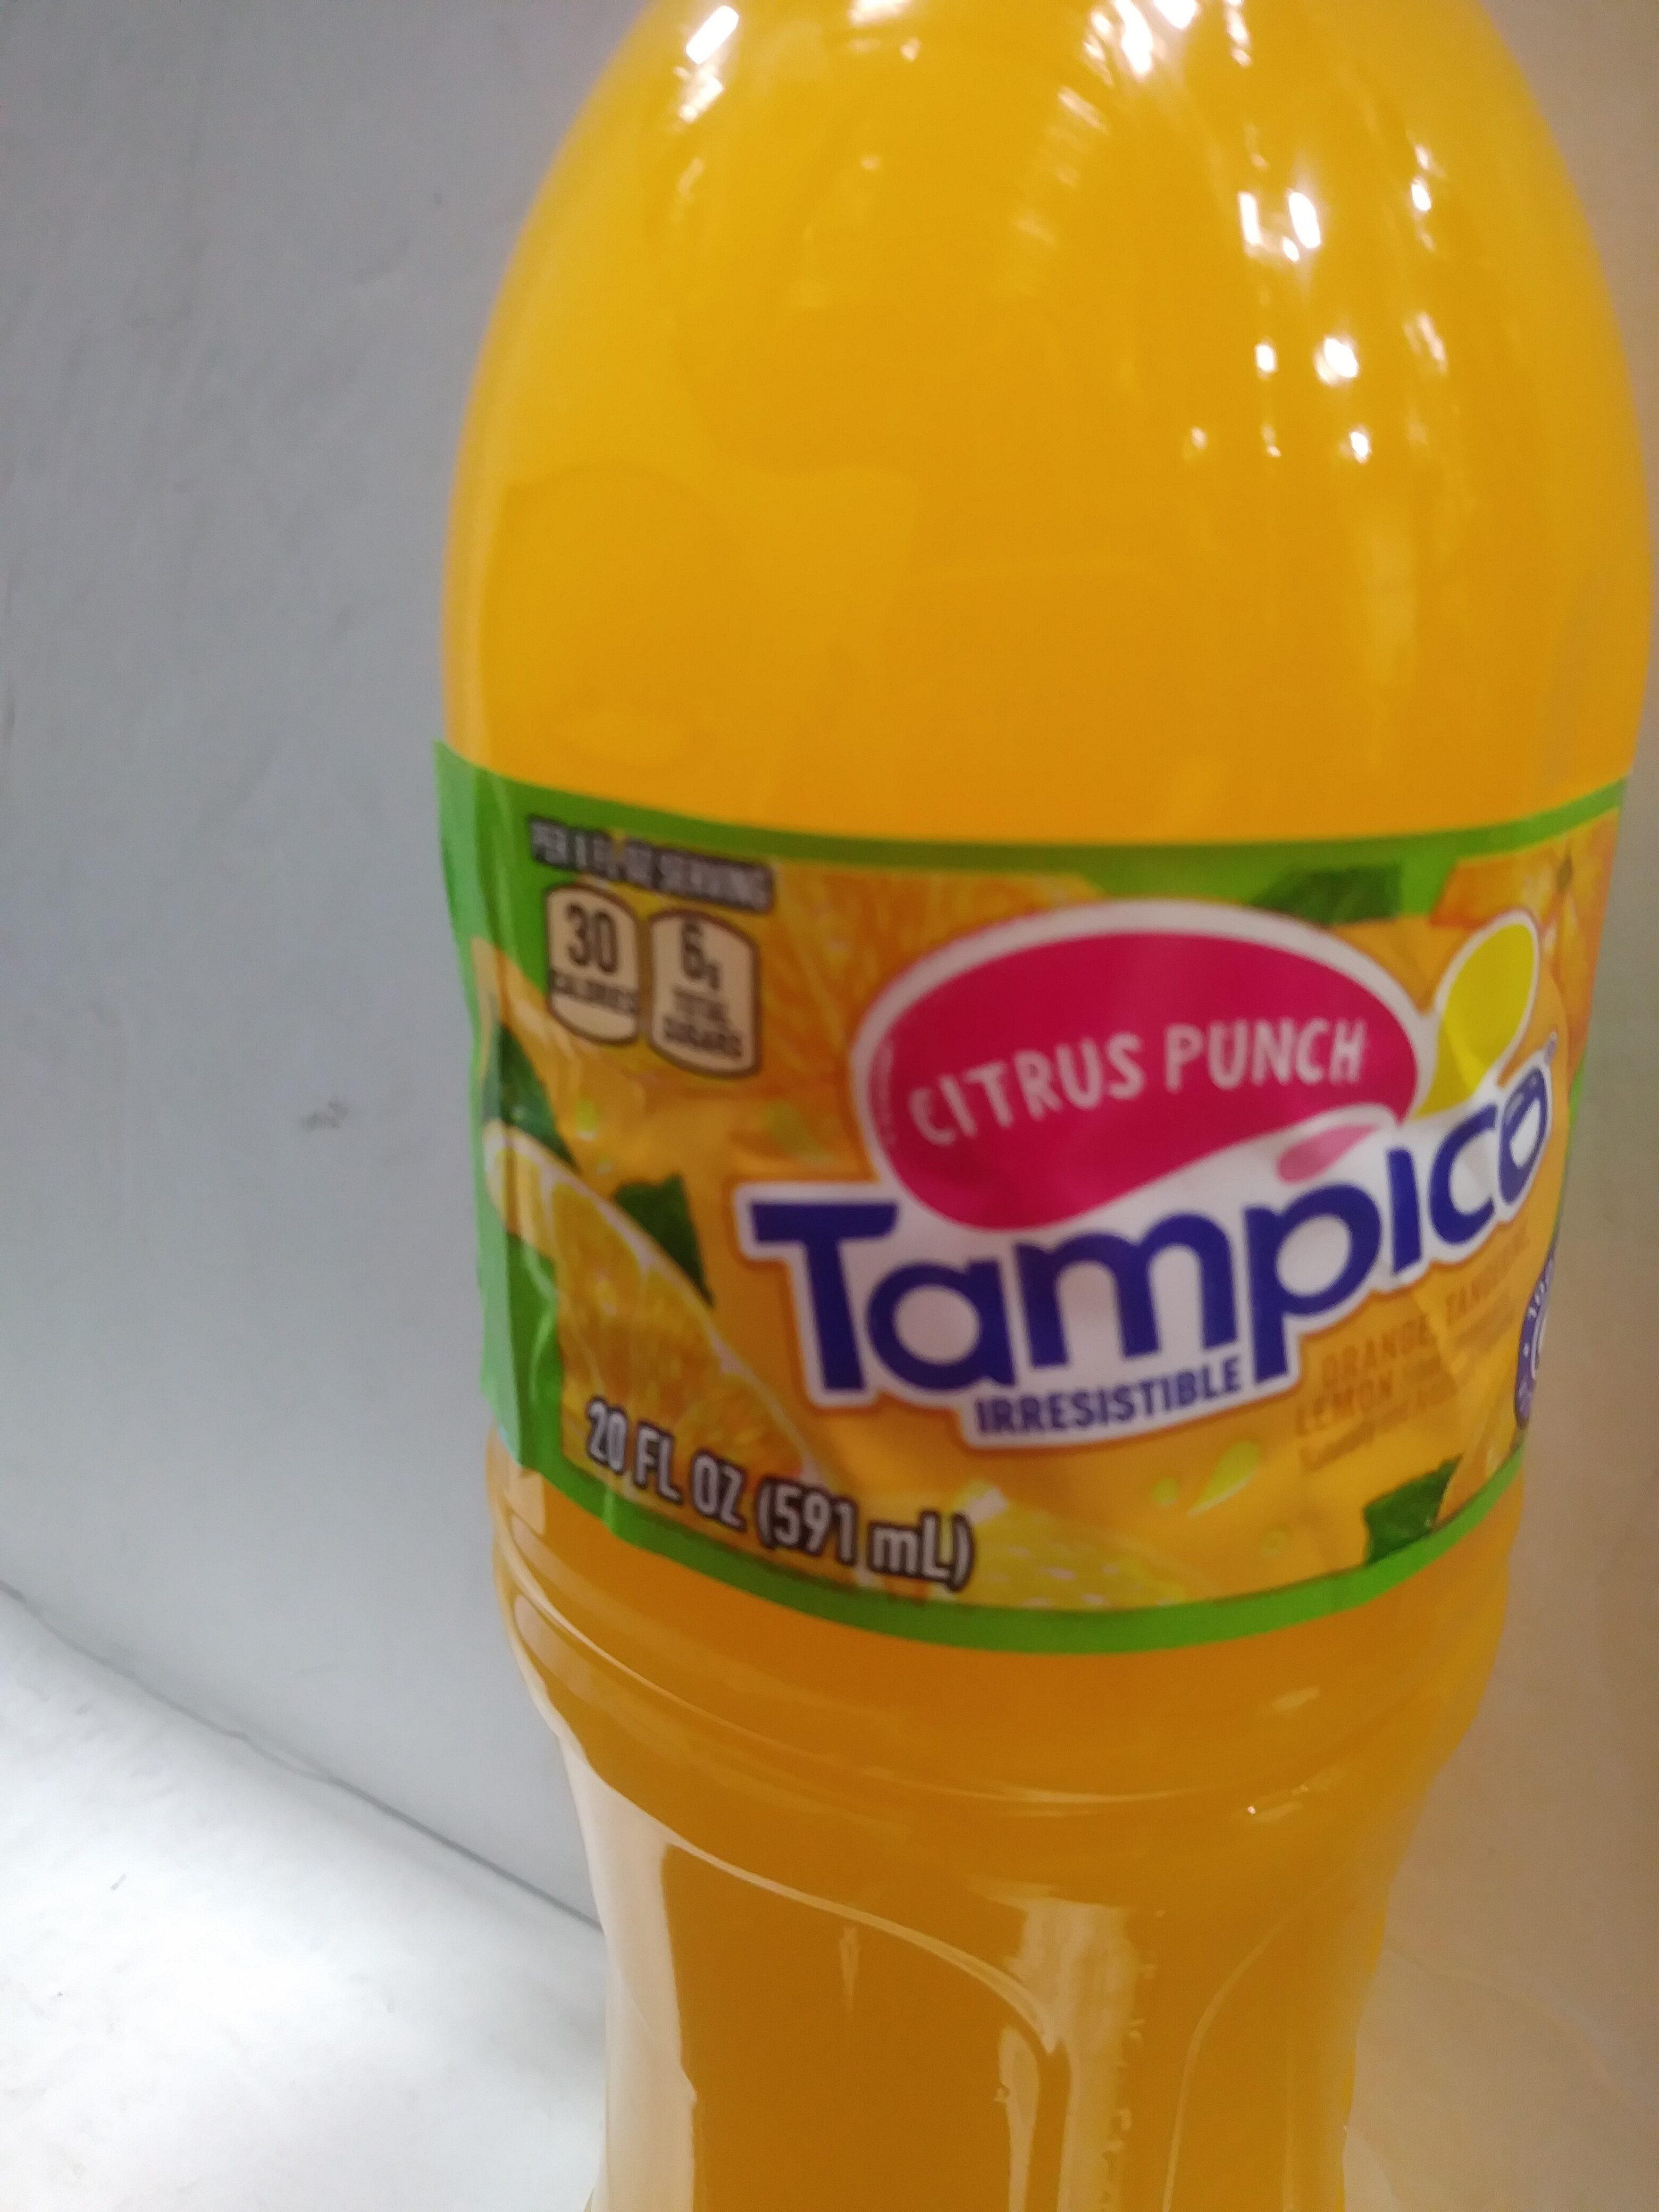 Citrus Punch Drink - Prodotto - en